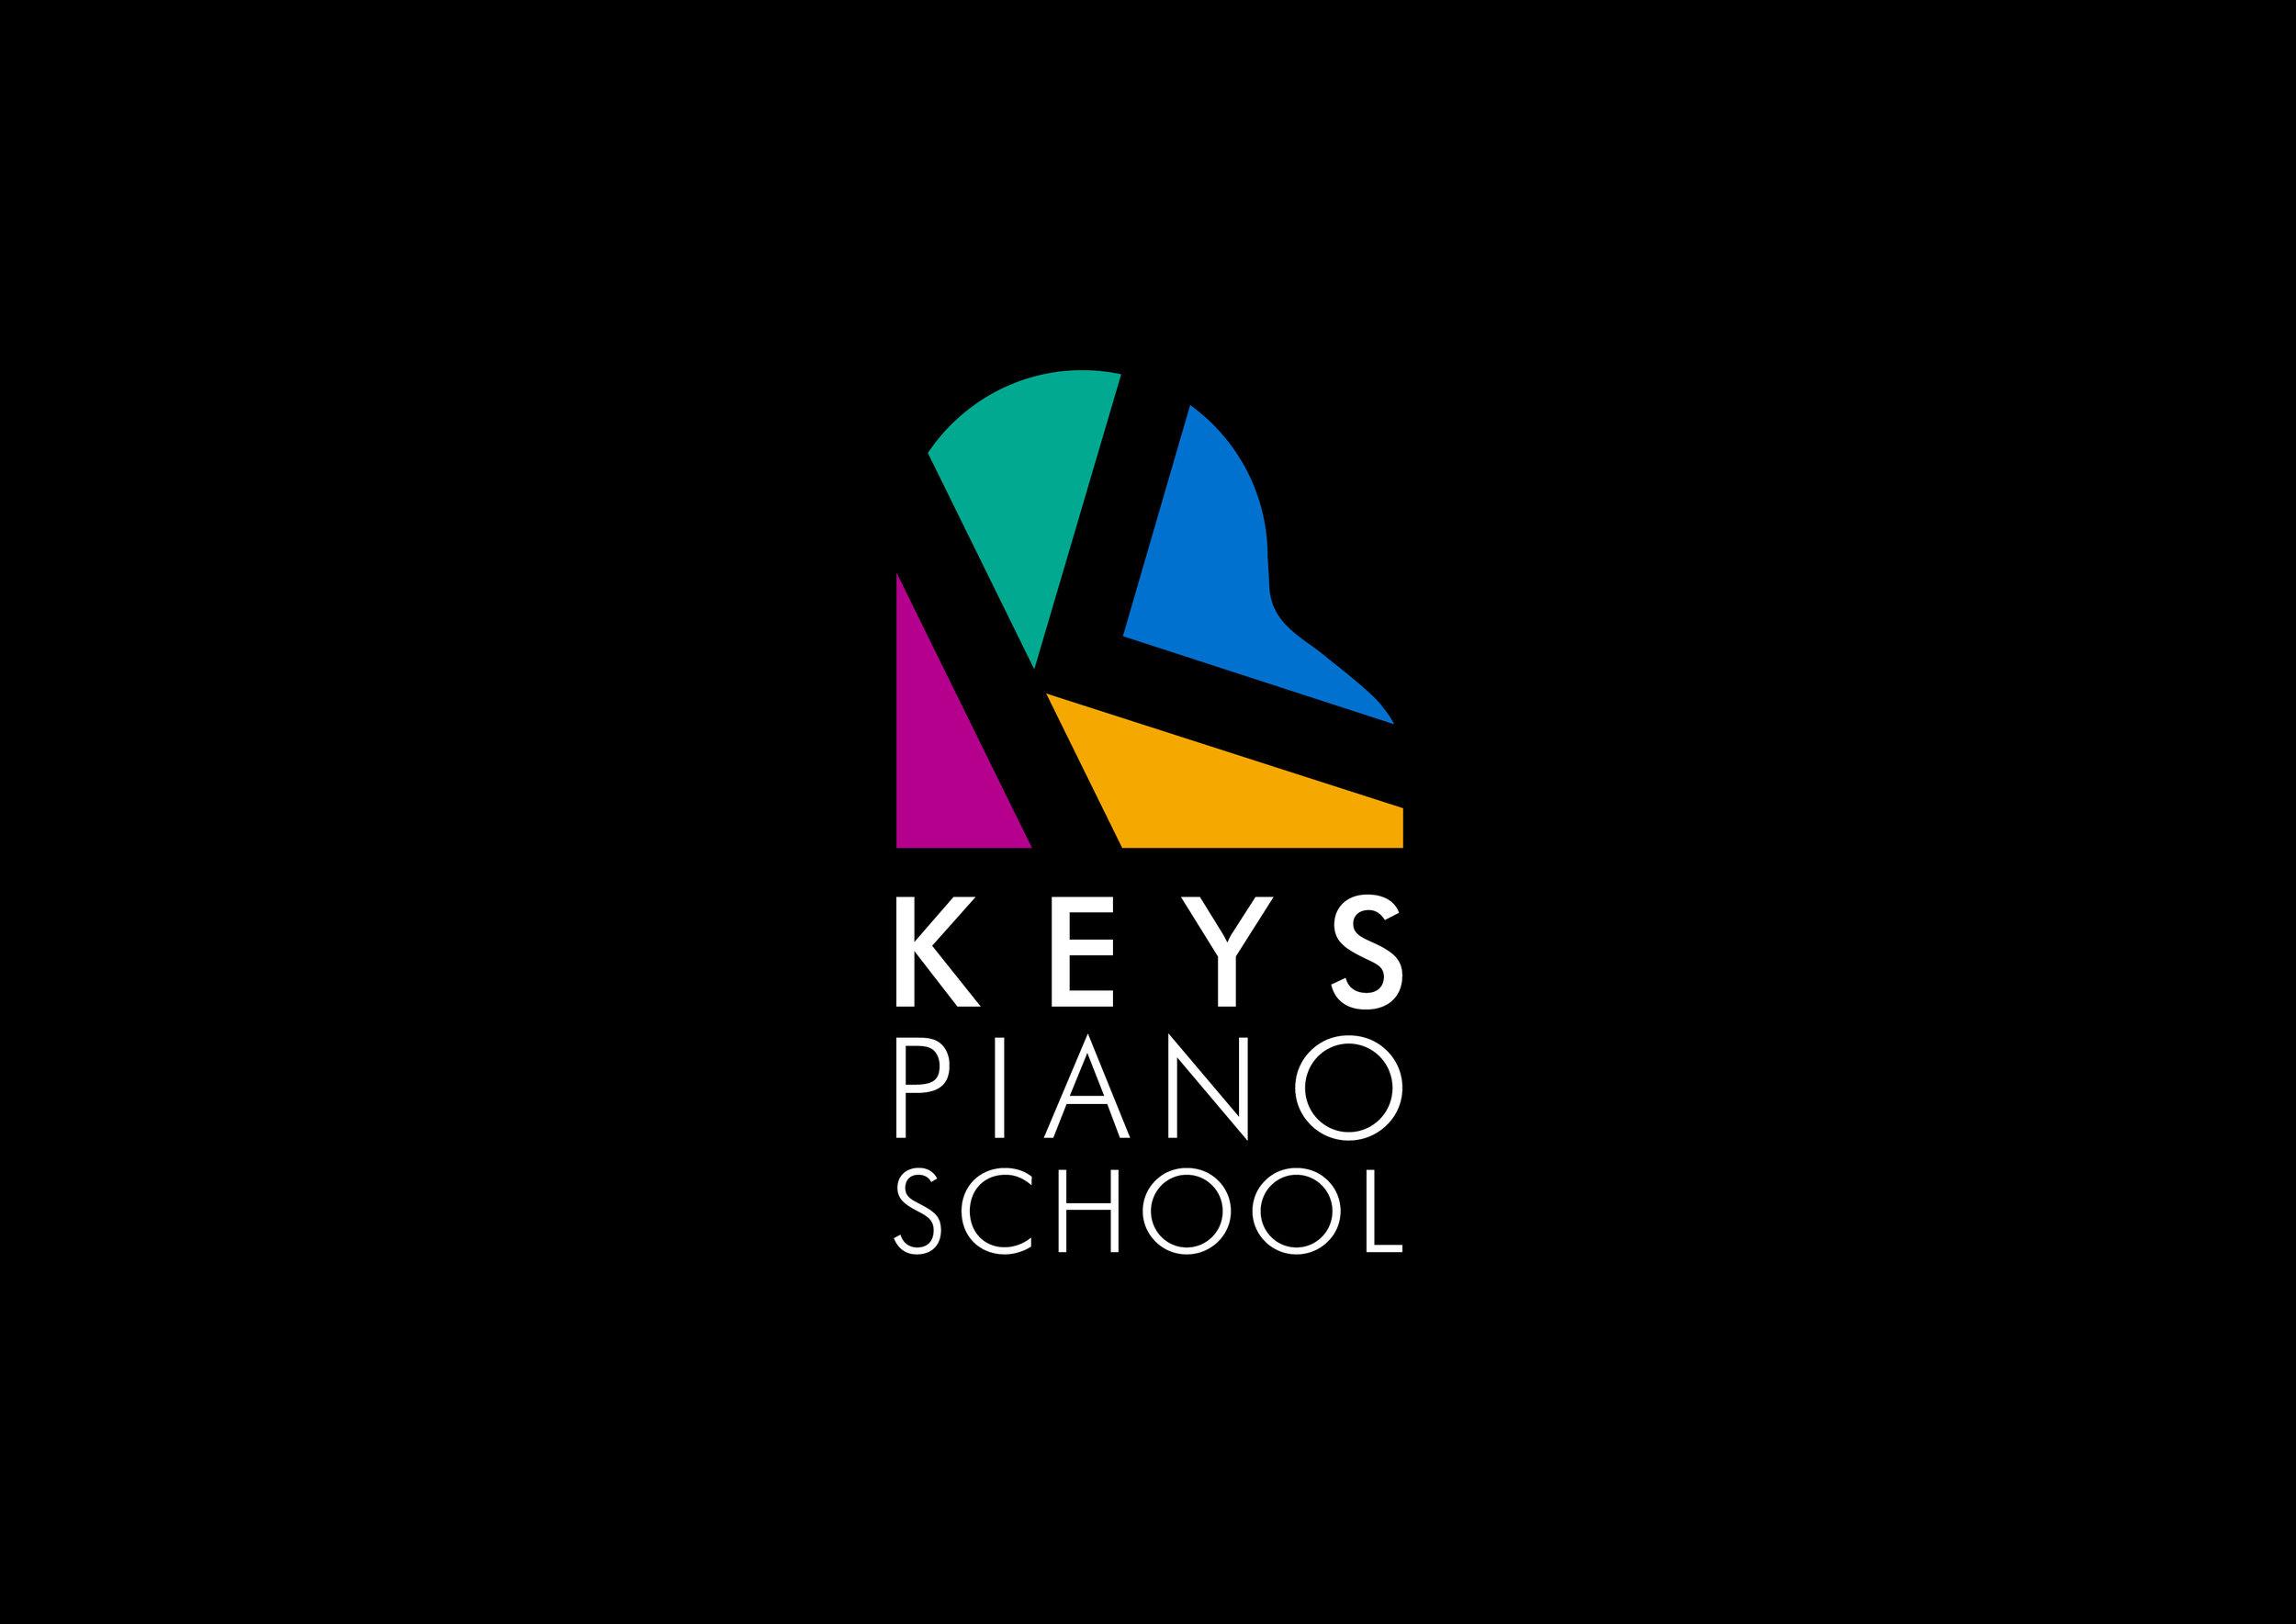 AEROPLANE_KEYS_PIANO_SCHOOL_MASTER_BRAND.jpg